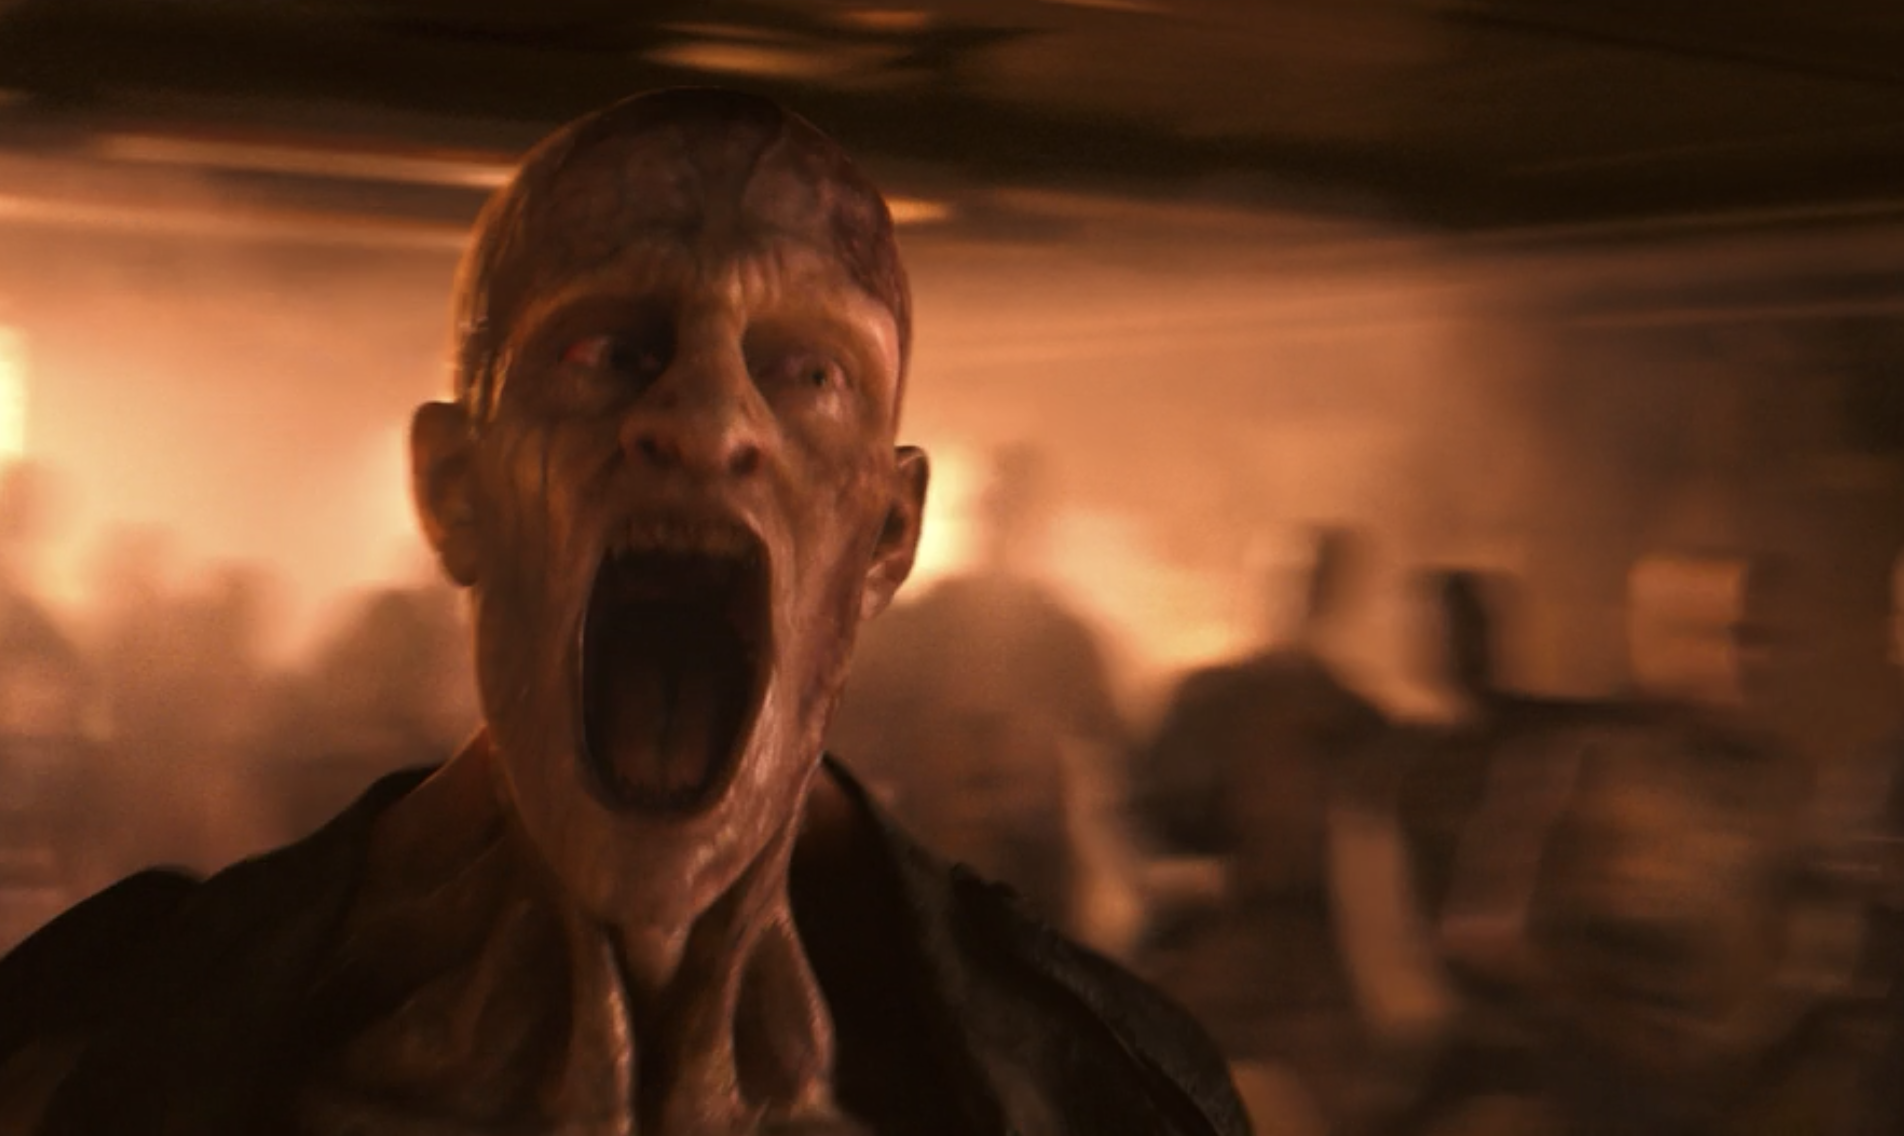 A mutant screaming